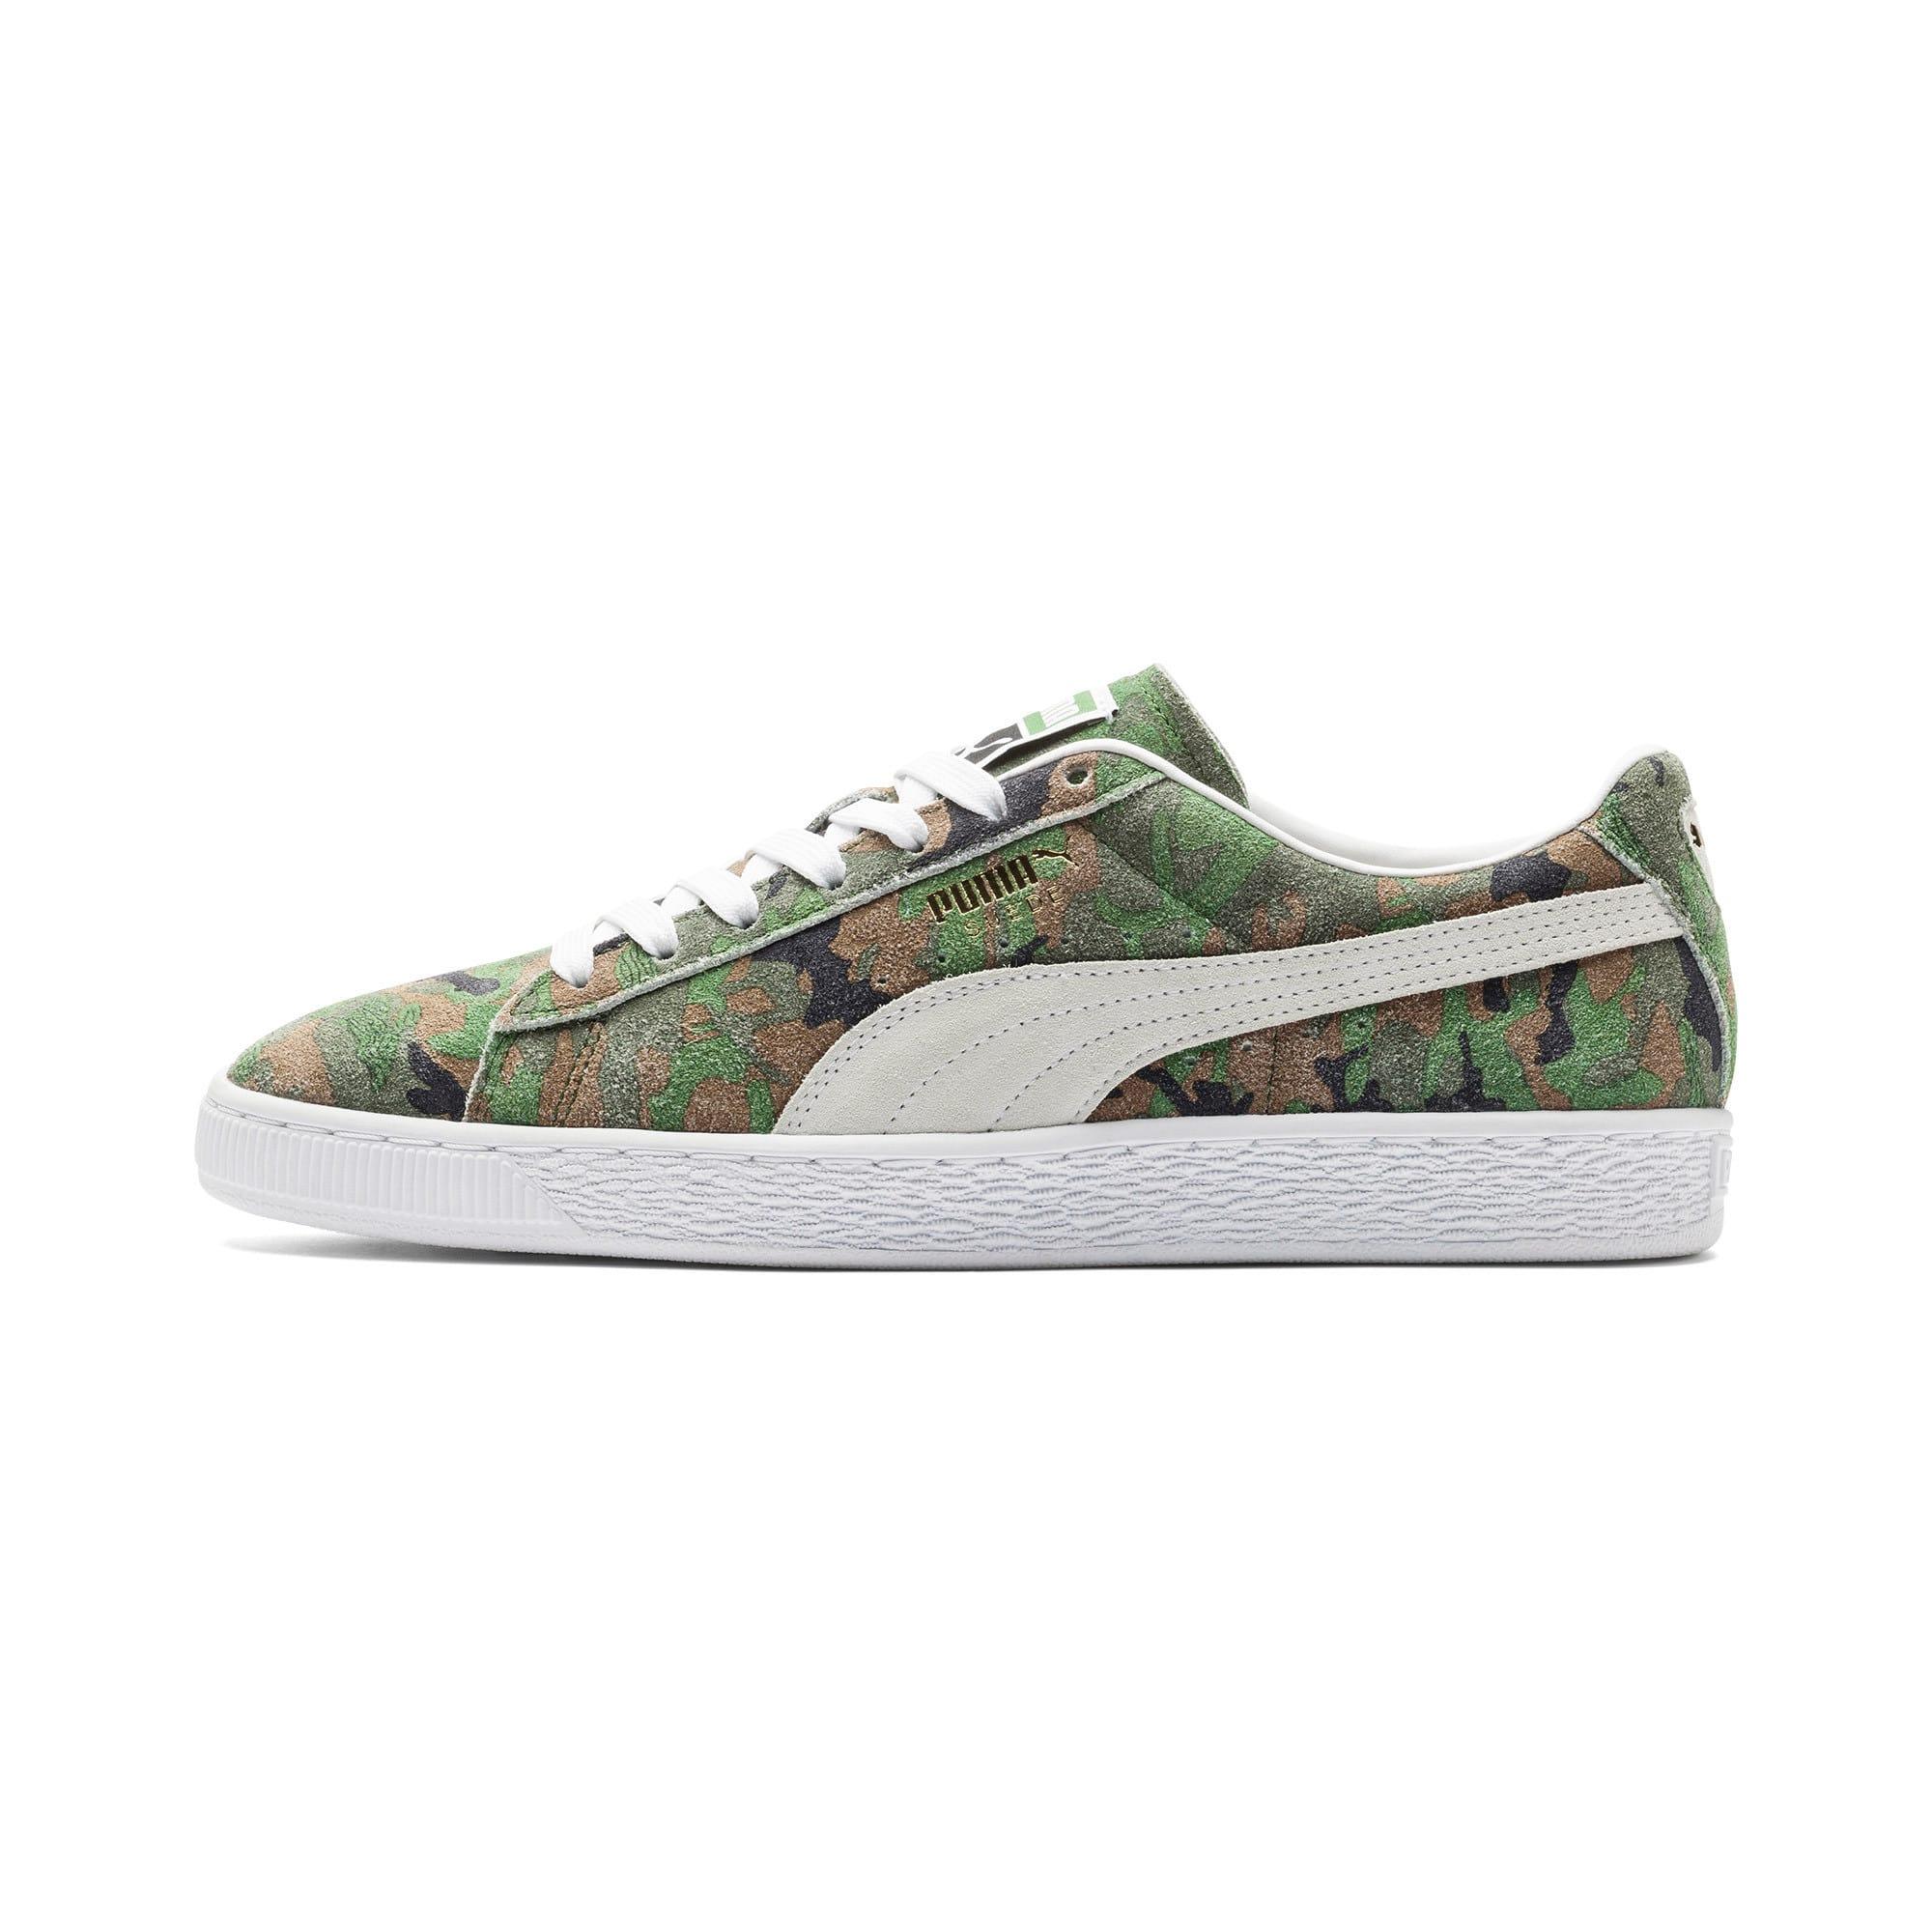 Thumbnail 1 of Suede Classic Ambush Sneakers, Dachsund-Green-Black-White, medium